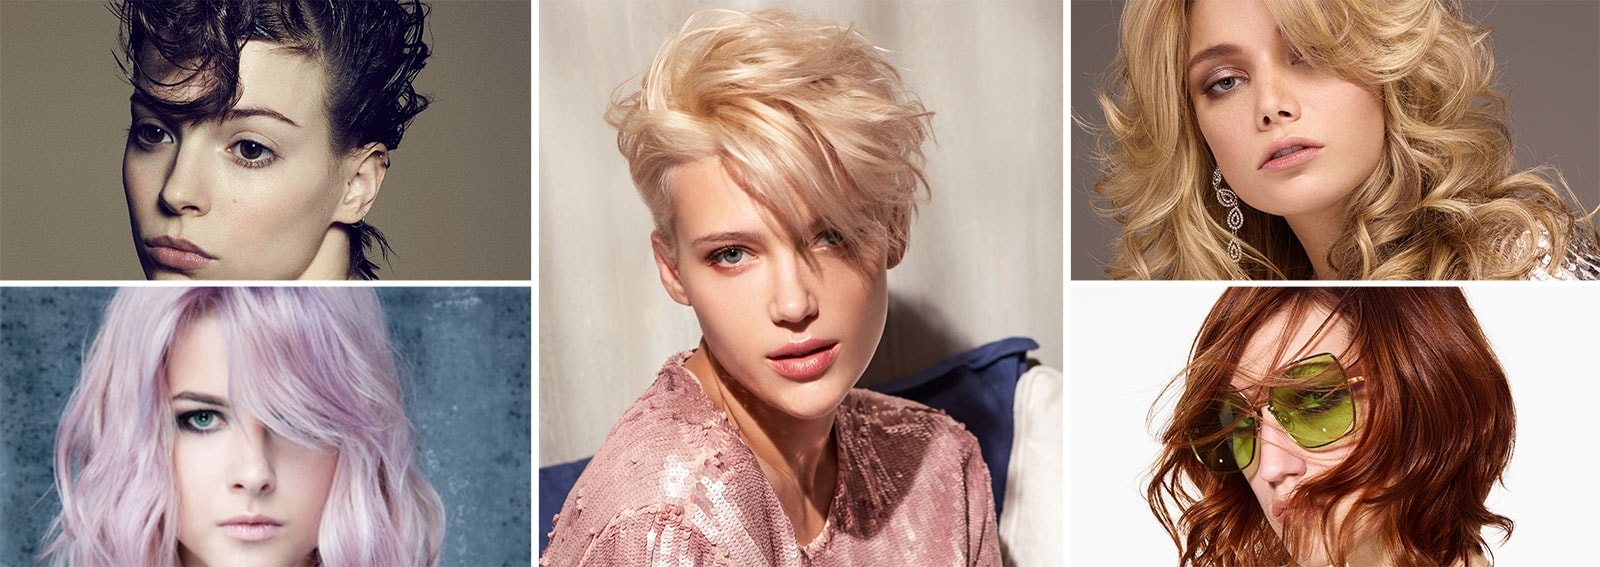 Tendenze-capelli-Primavera-Estate-2019-desktop